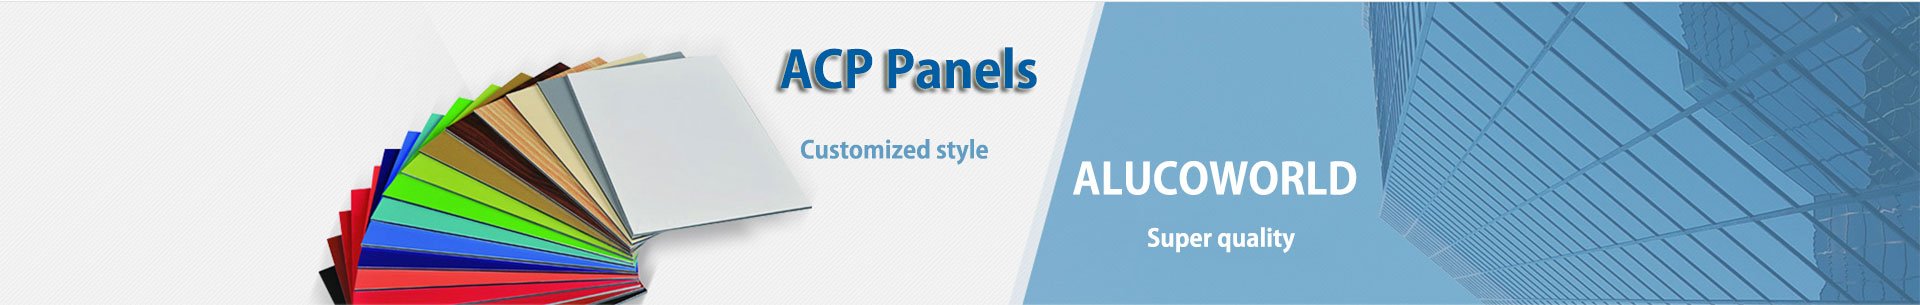 Acp  banner